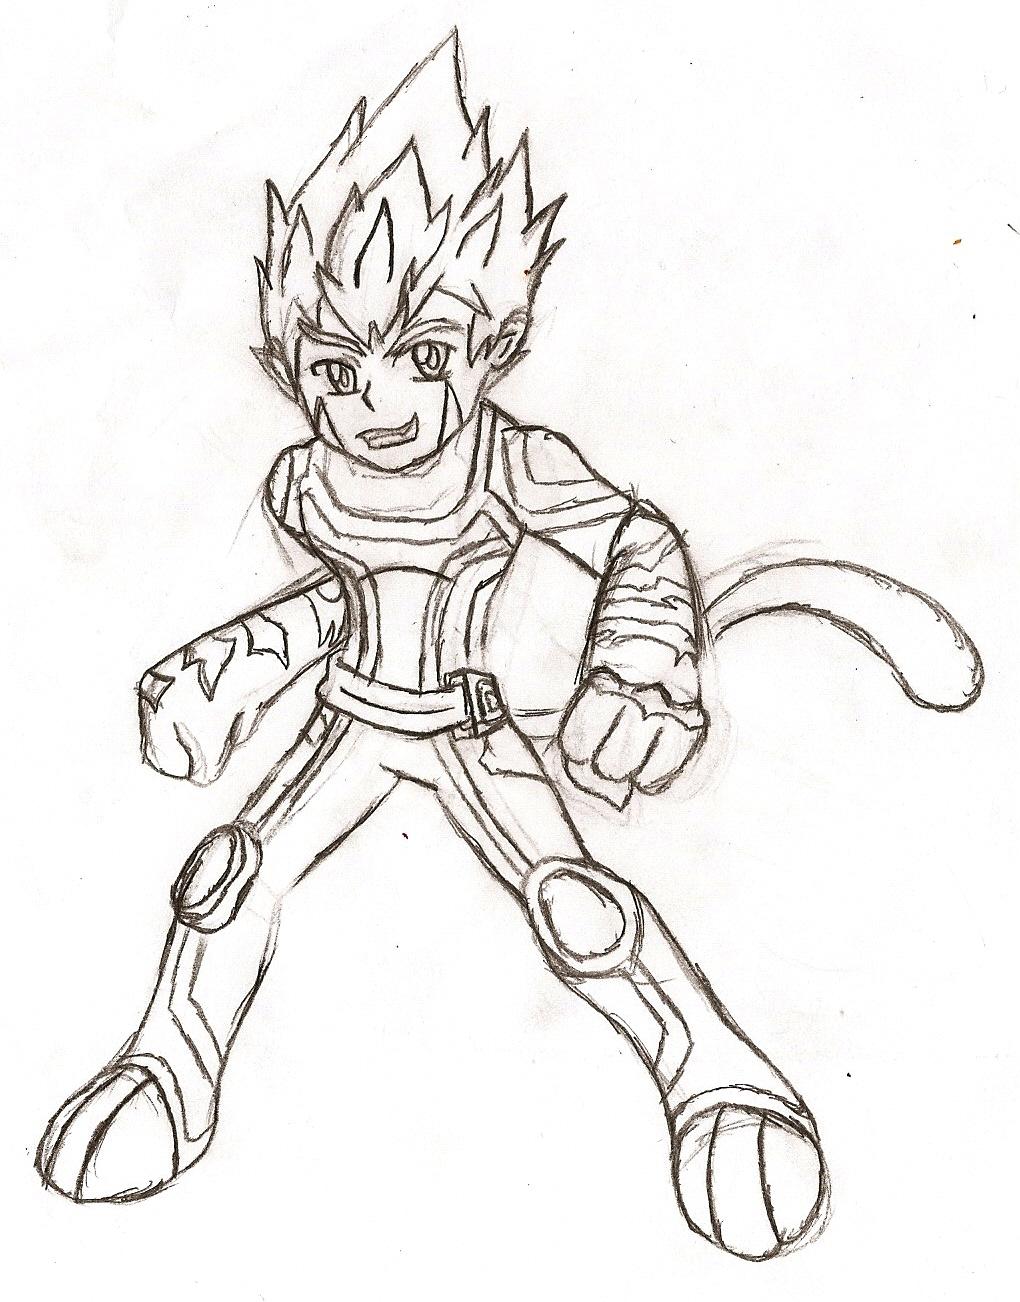 Odd Sketch by NeonNeoz